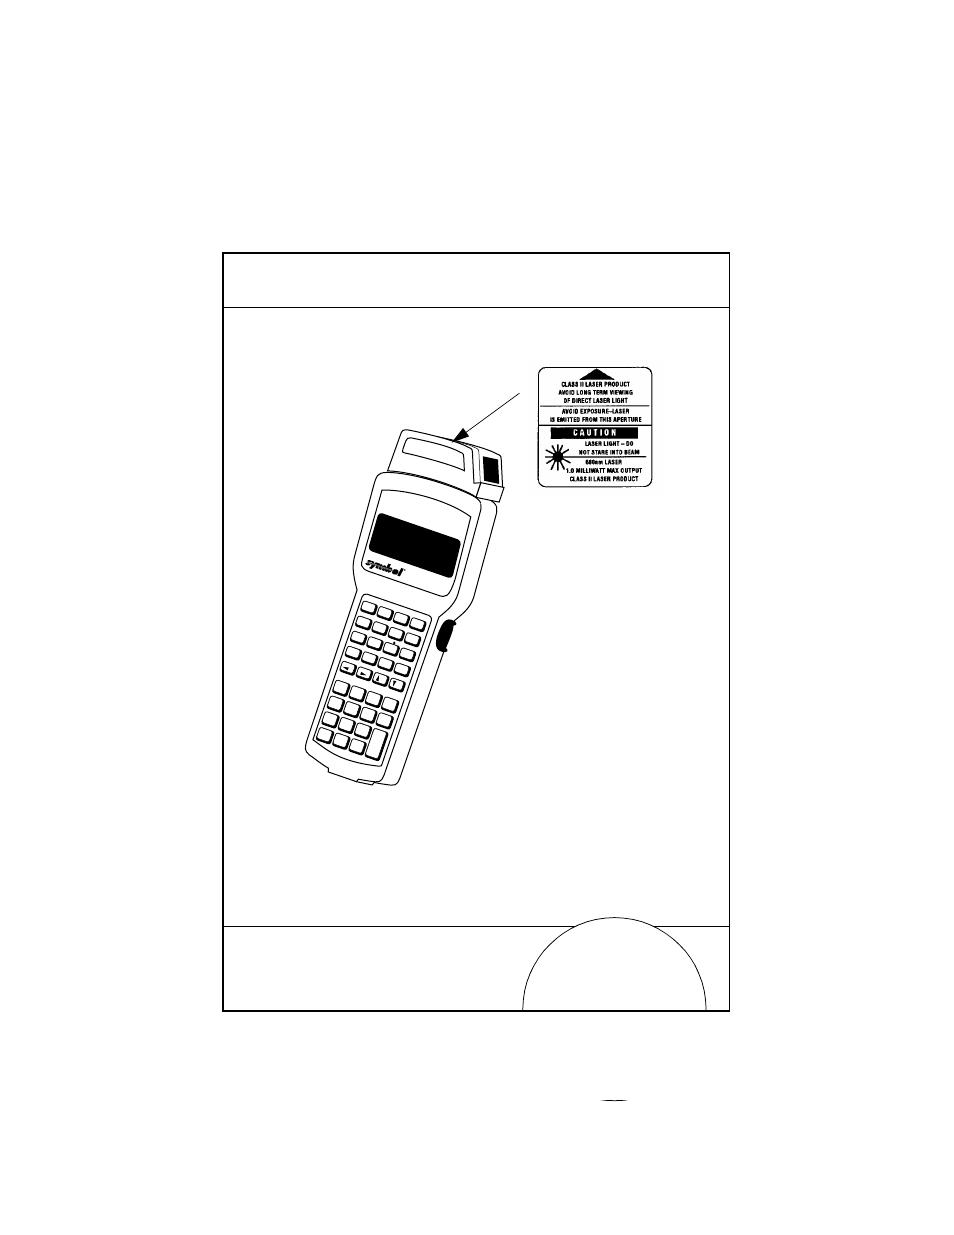 Scanner Labeling Symbol Technologies 3100 Series User Manual